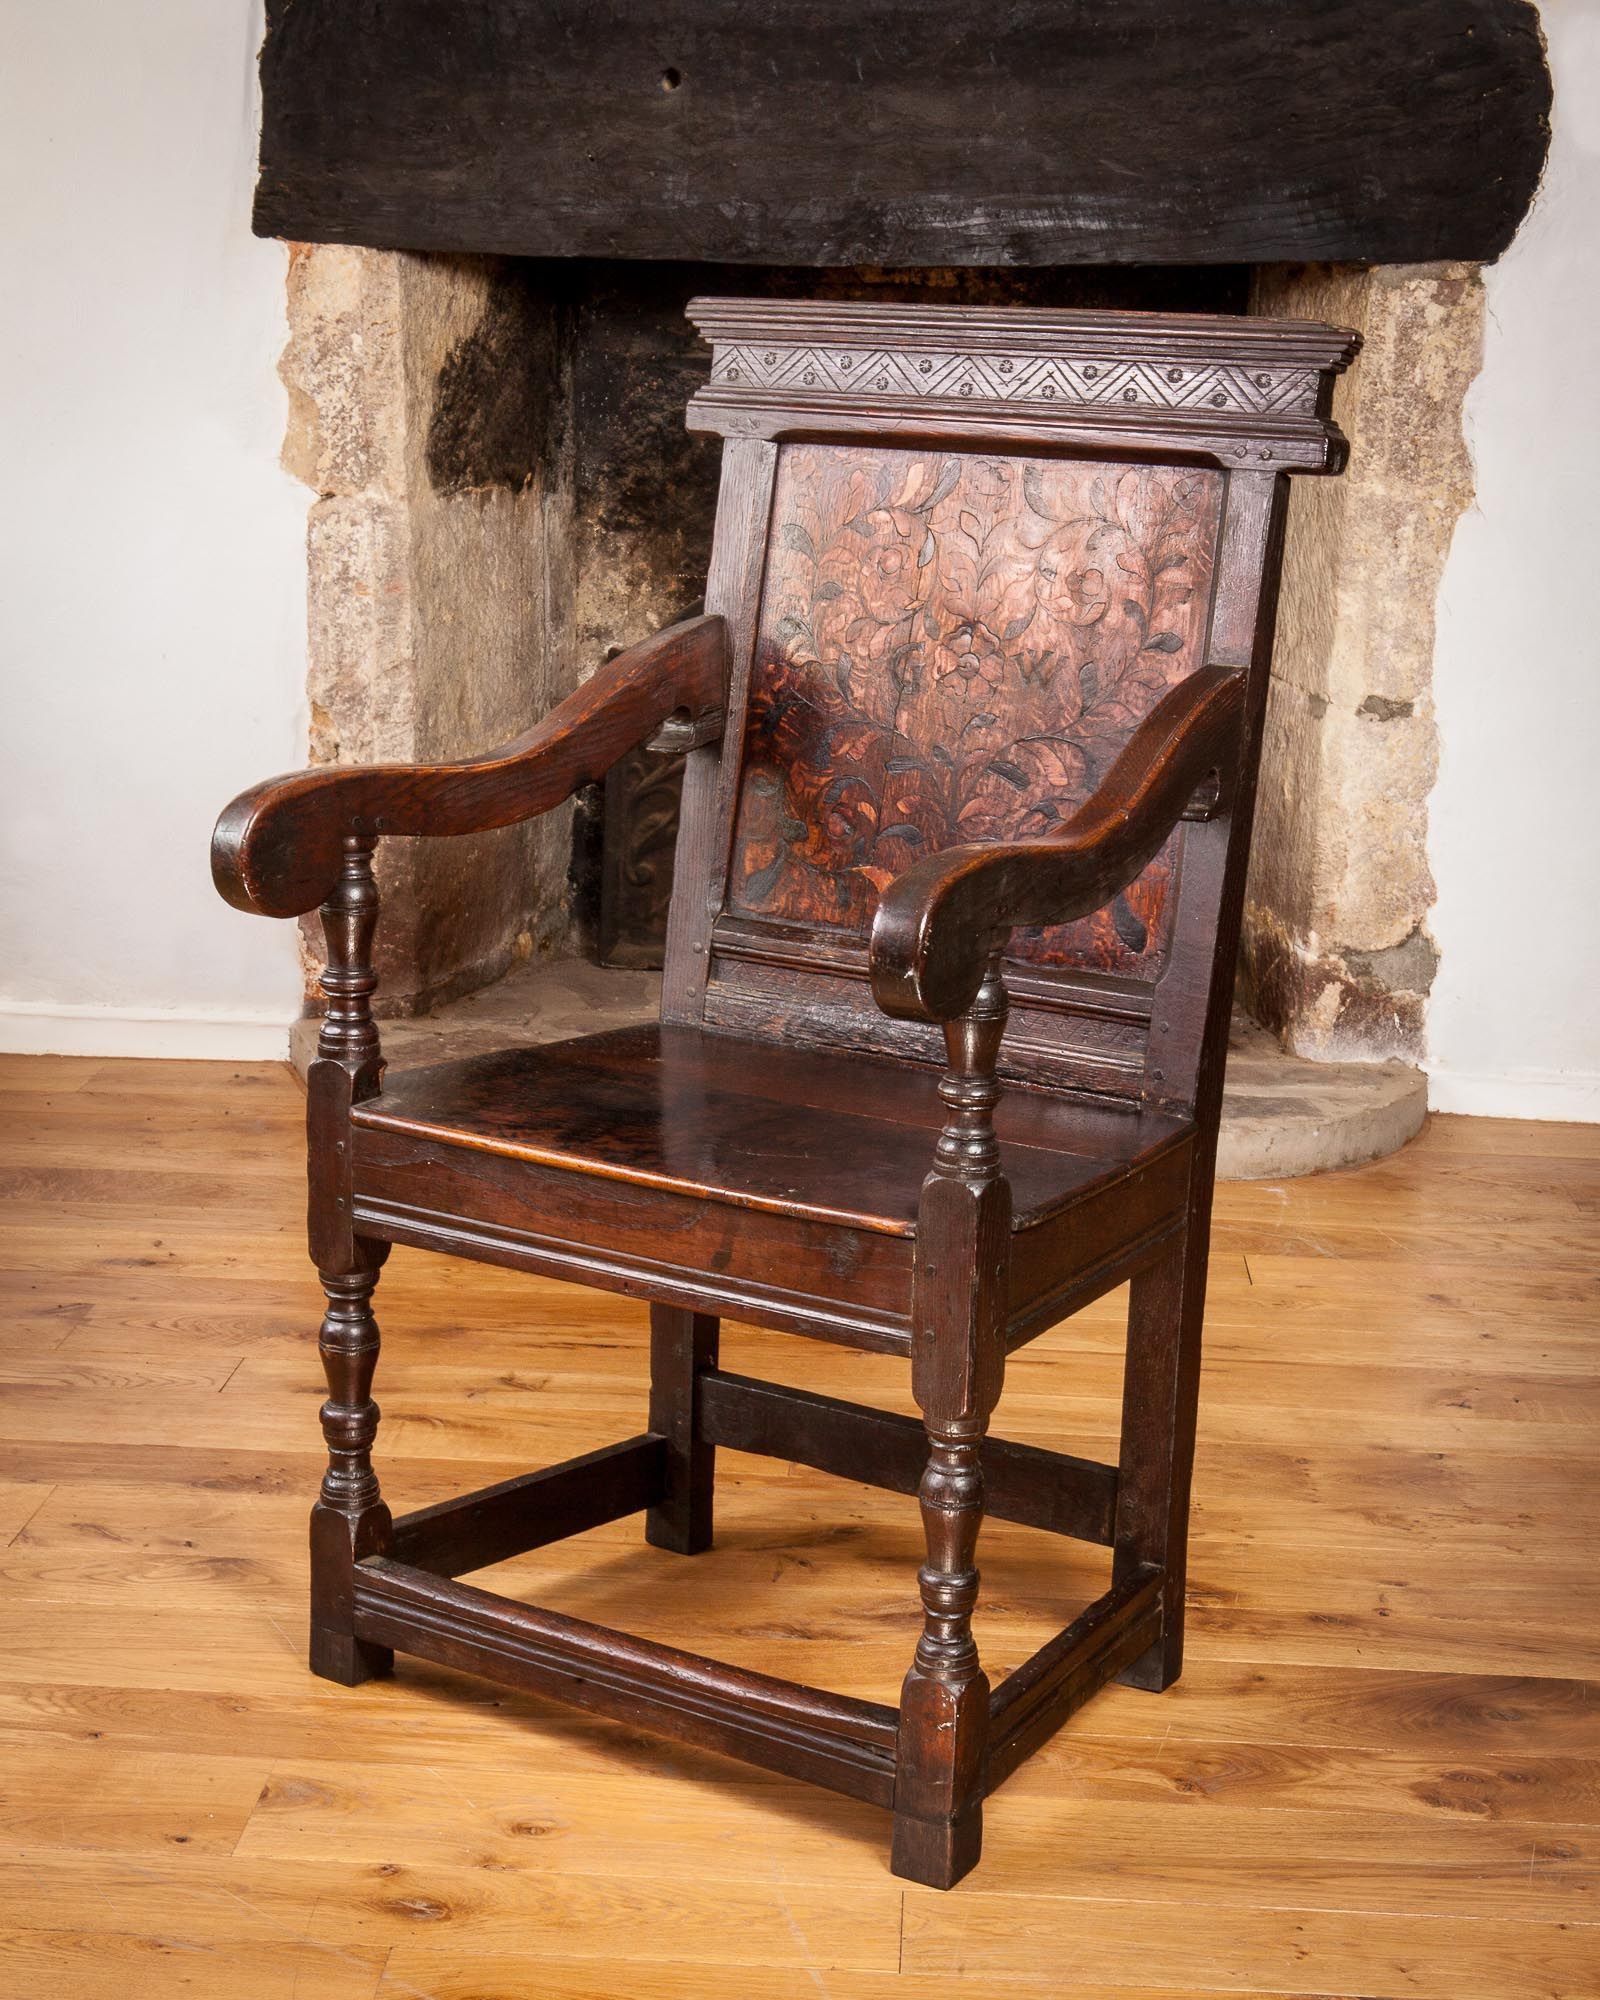 Early 17th century Leeds inlaid oak armchair, circa 1620 - 1640 ...